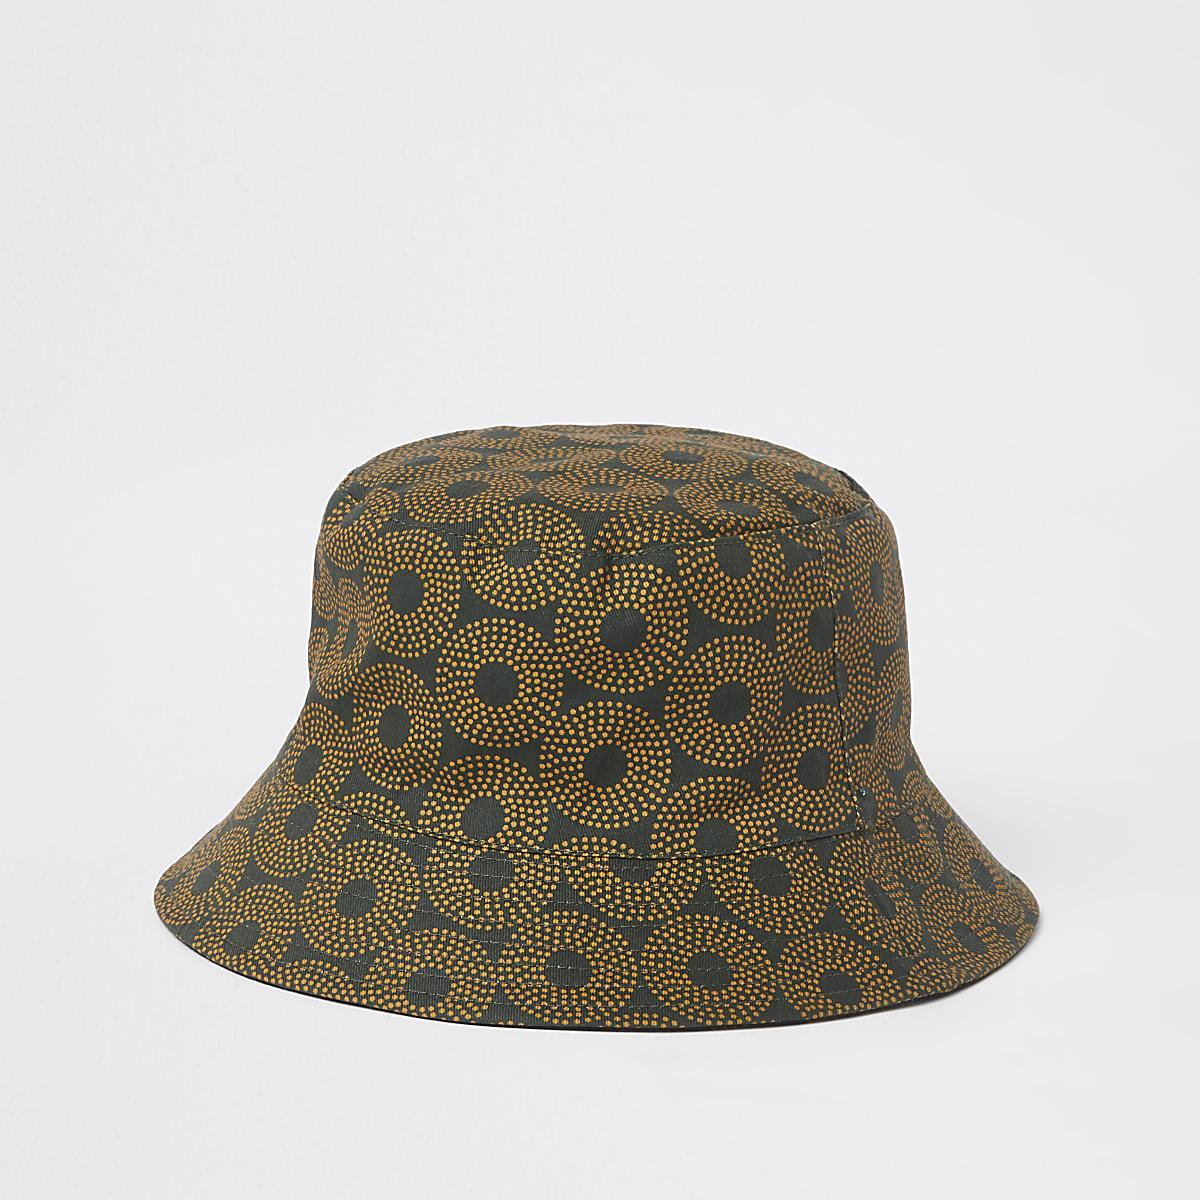 5edec458 Khaki green aztec print bucket hat - Hats / Caps - Accessories - men